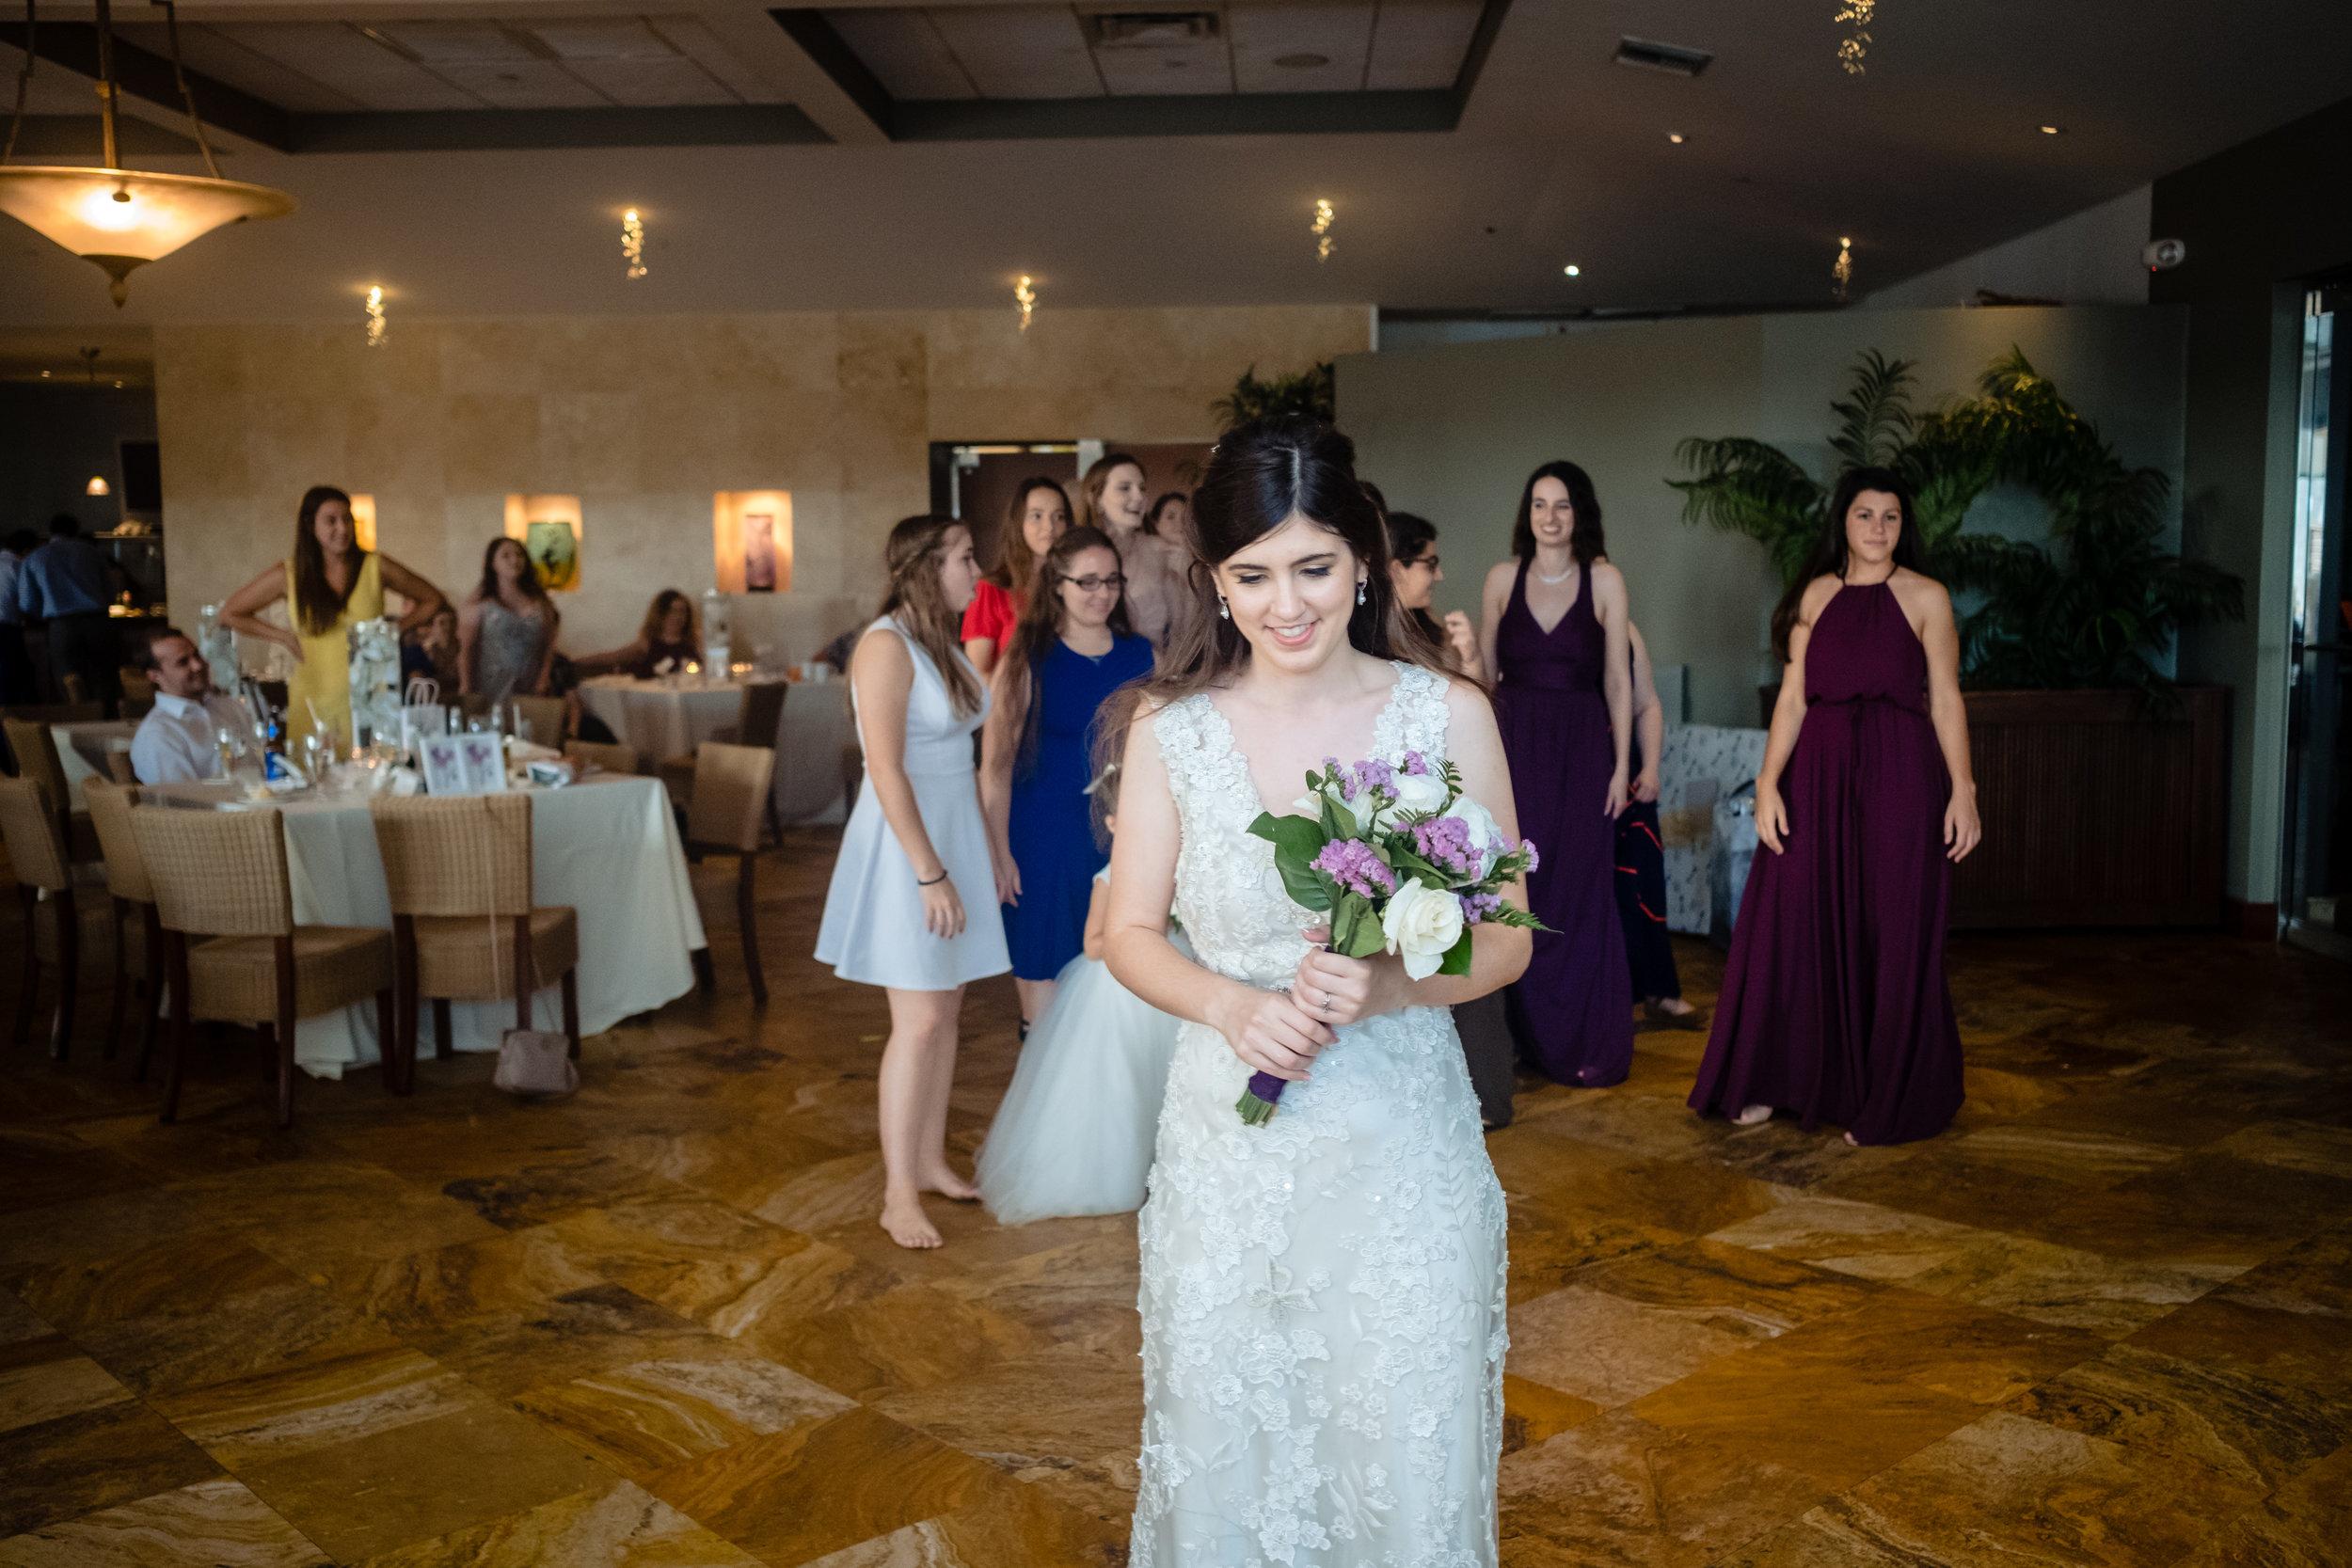 HAH_Zoe and Daniel_Clearwater Wedding_747_2018.jpg